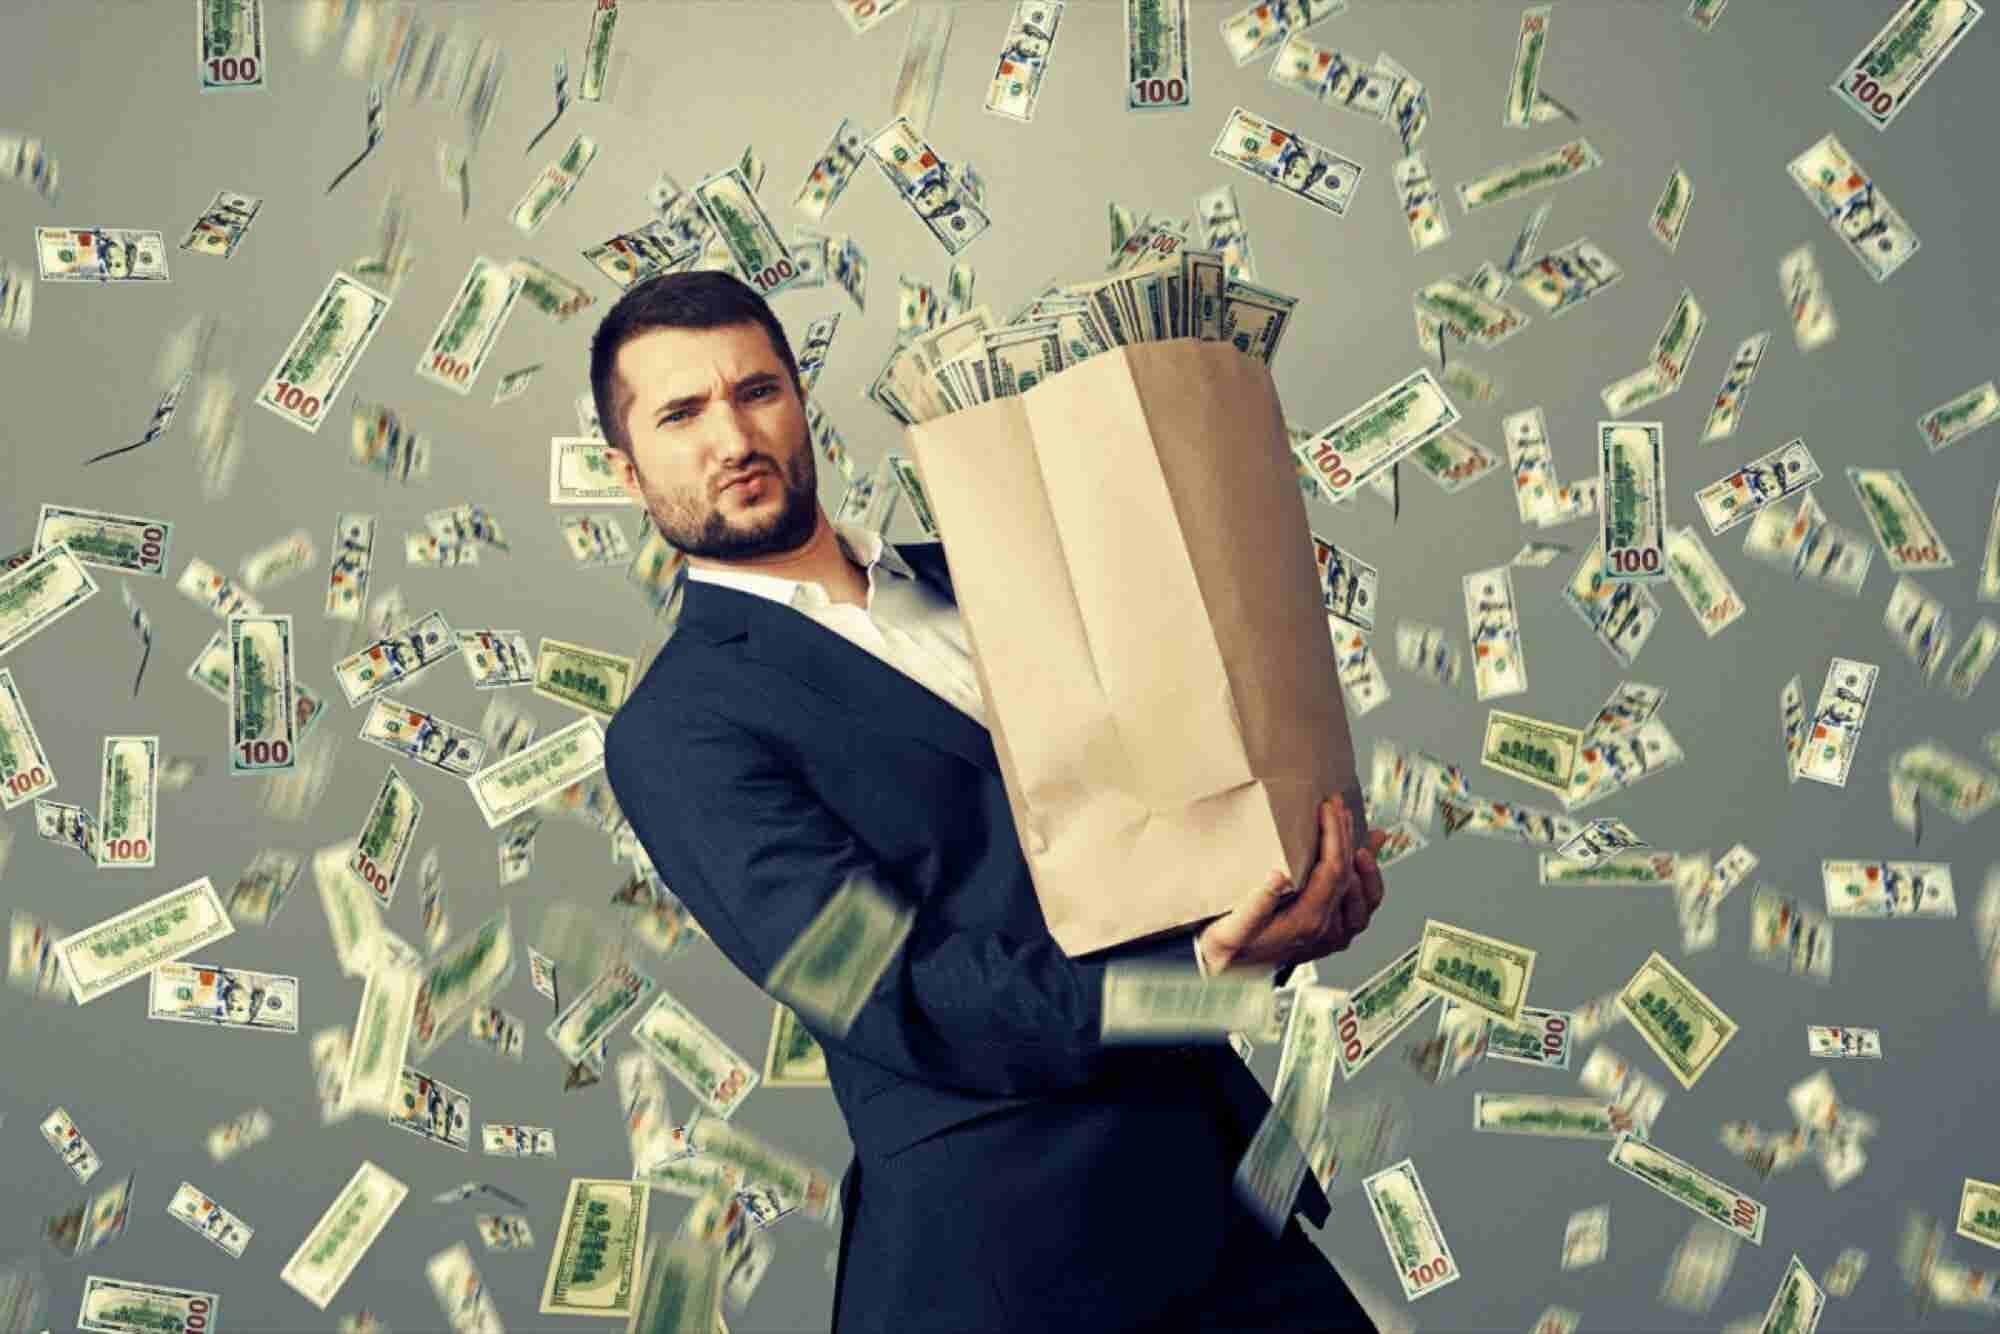 Cómo multiplicar tu fortuna